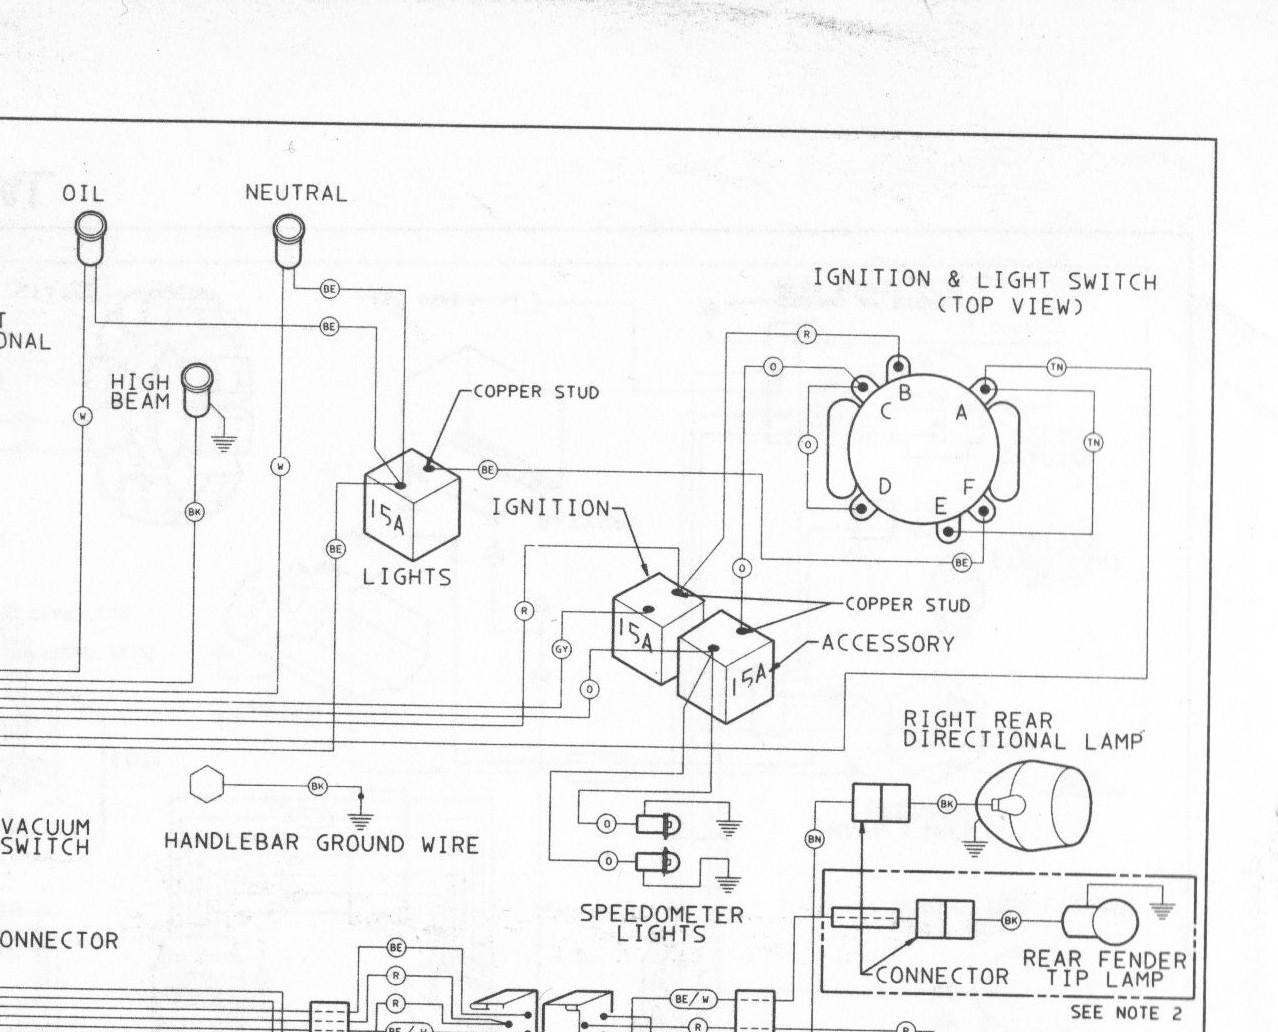 hight resolution of harley davidson voltage regulator wiring diagram wiring diagram image oreck sweeper diagram car med tech ambulance